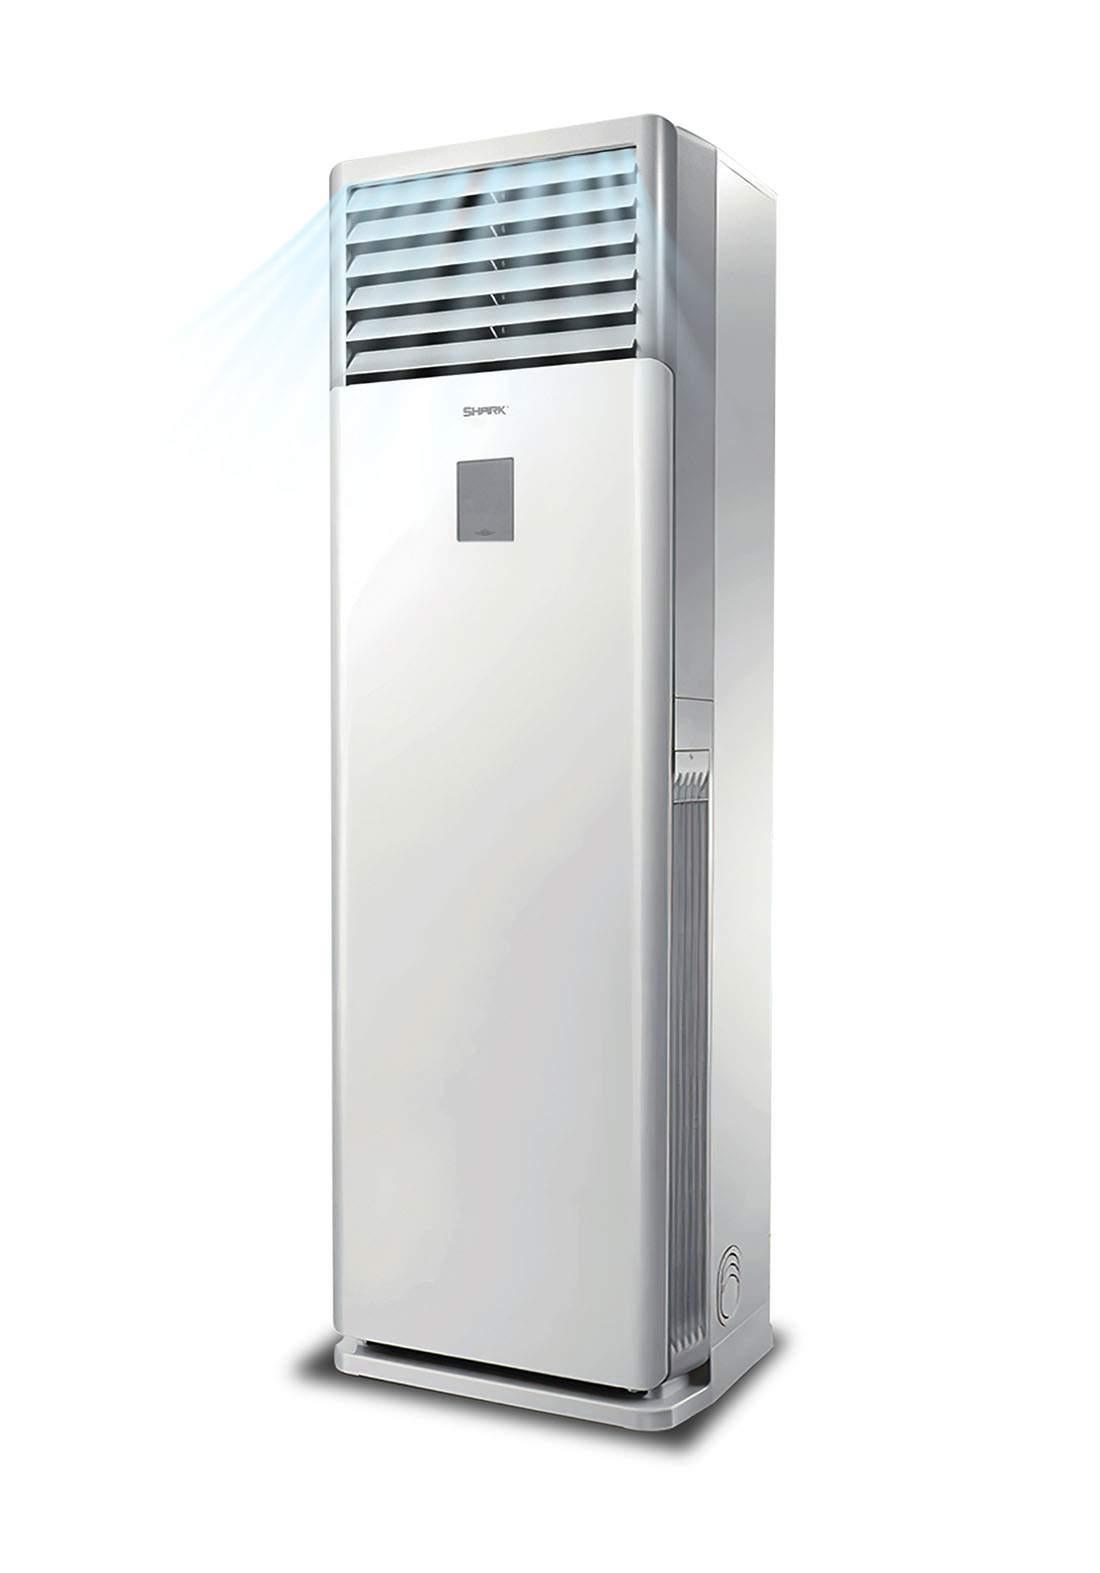 Shark Split Vertical Air Conditioner 3 Ton 36000 X - سبلت عمودي 3 طن